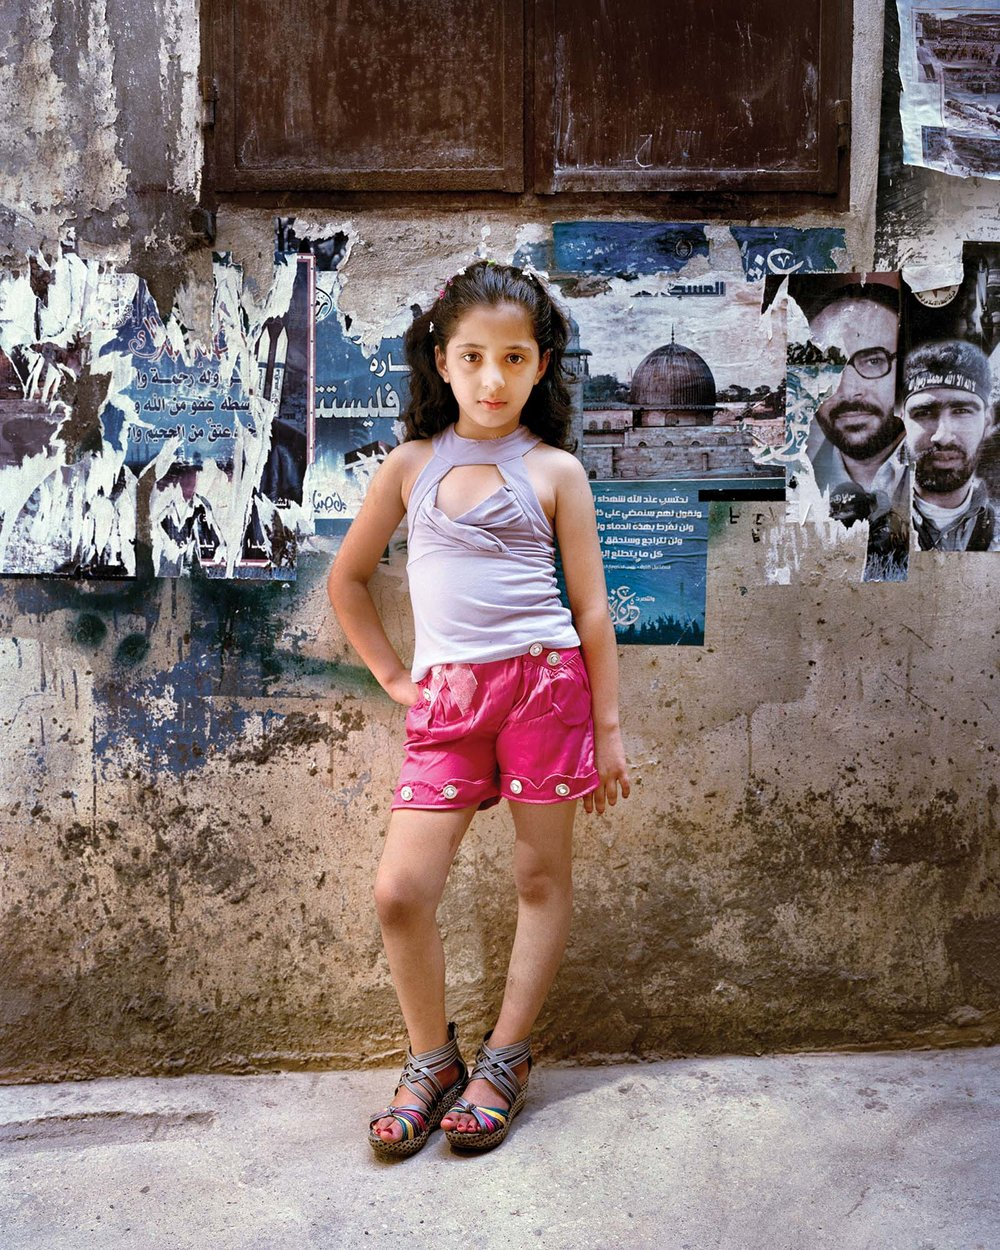 Dania 9, Bourj El Barajneh Refugee Camp, Beirut Lebanon - Digital Photograph, 2011, © Rania Matar